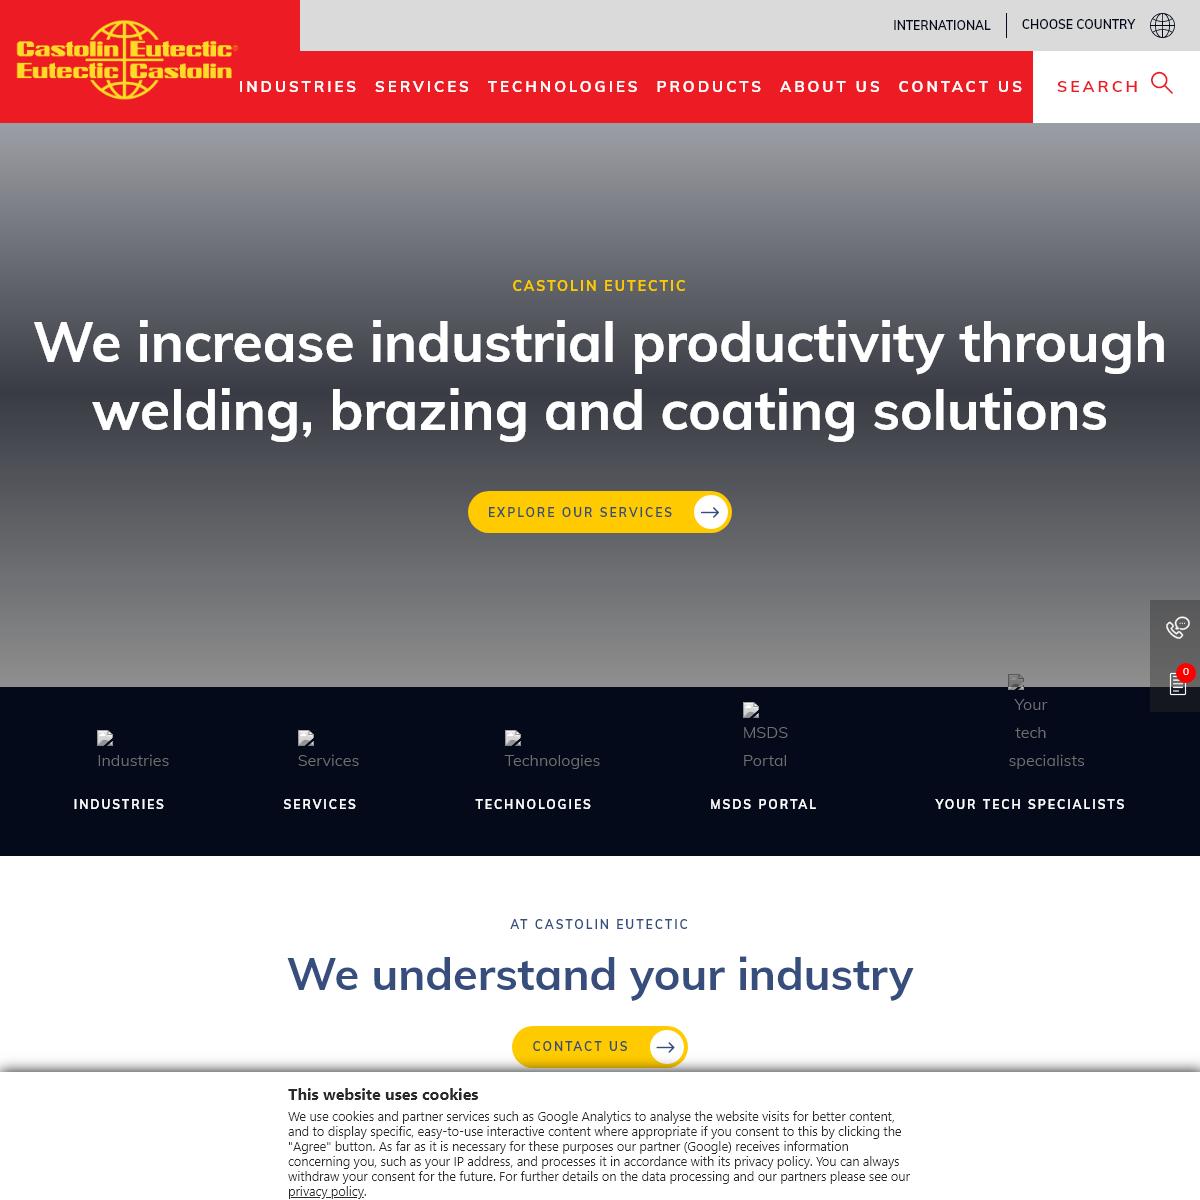 Welding, brazing and coating solutions, wearplates - Castolin Eutectic